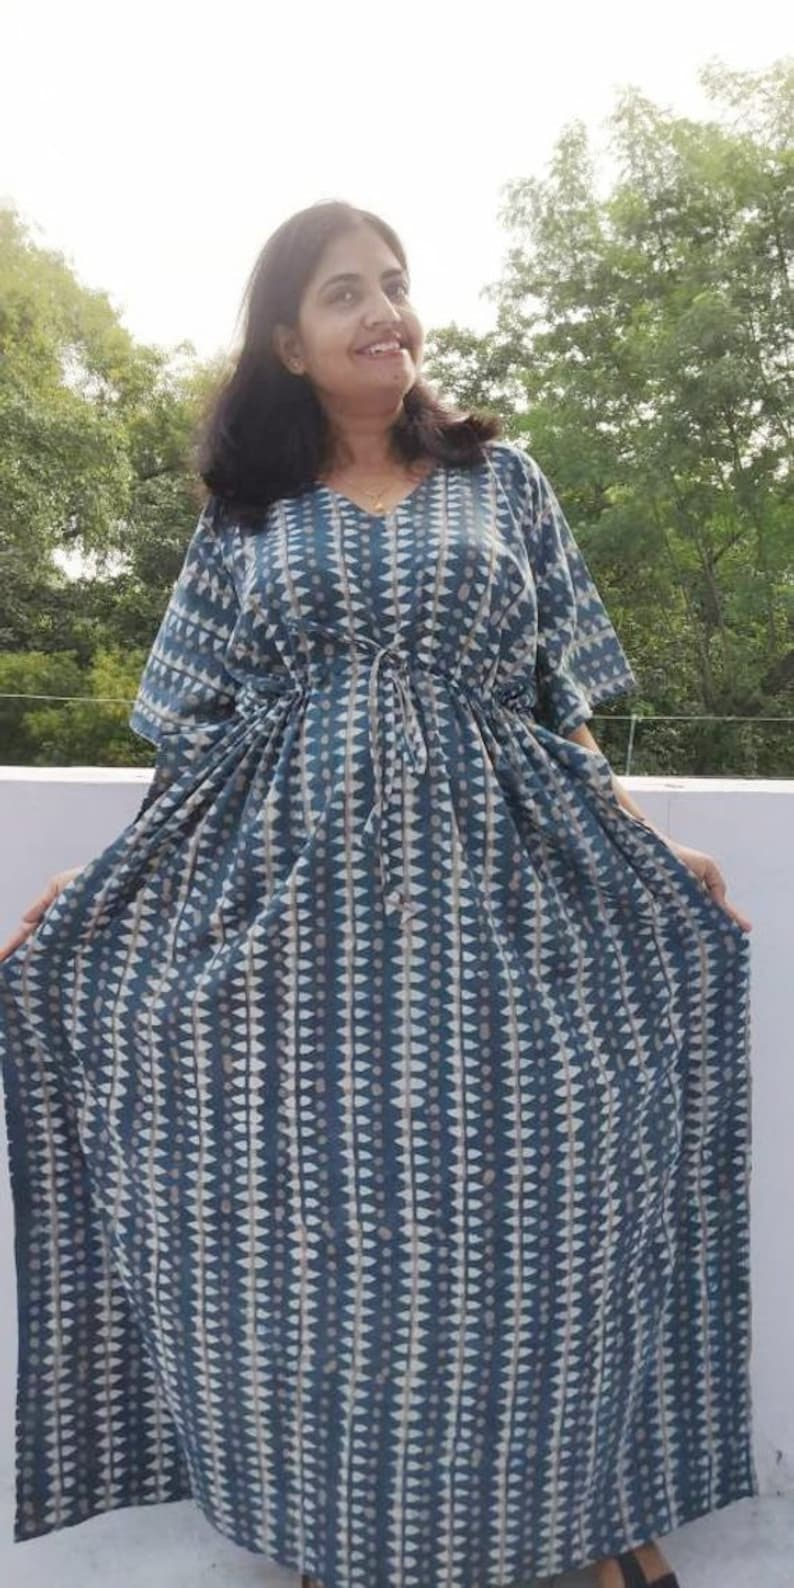 6560a75d66 Cotton Kimono Robe Plus size maxi dress kaftan Indian hand | Etsy